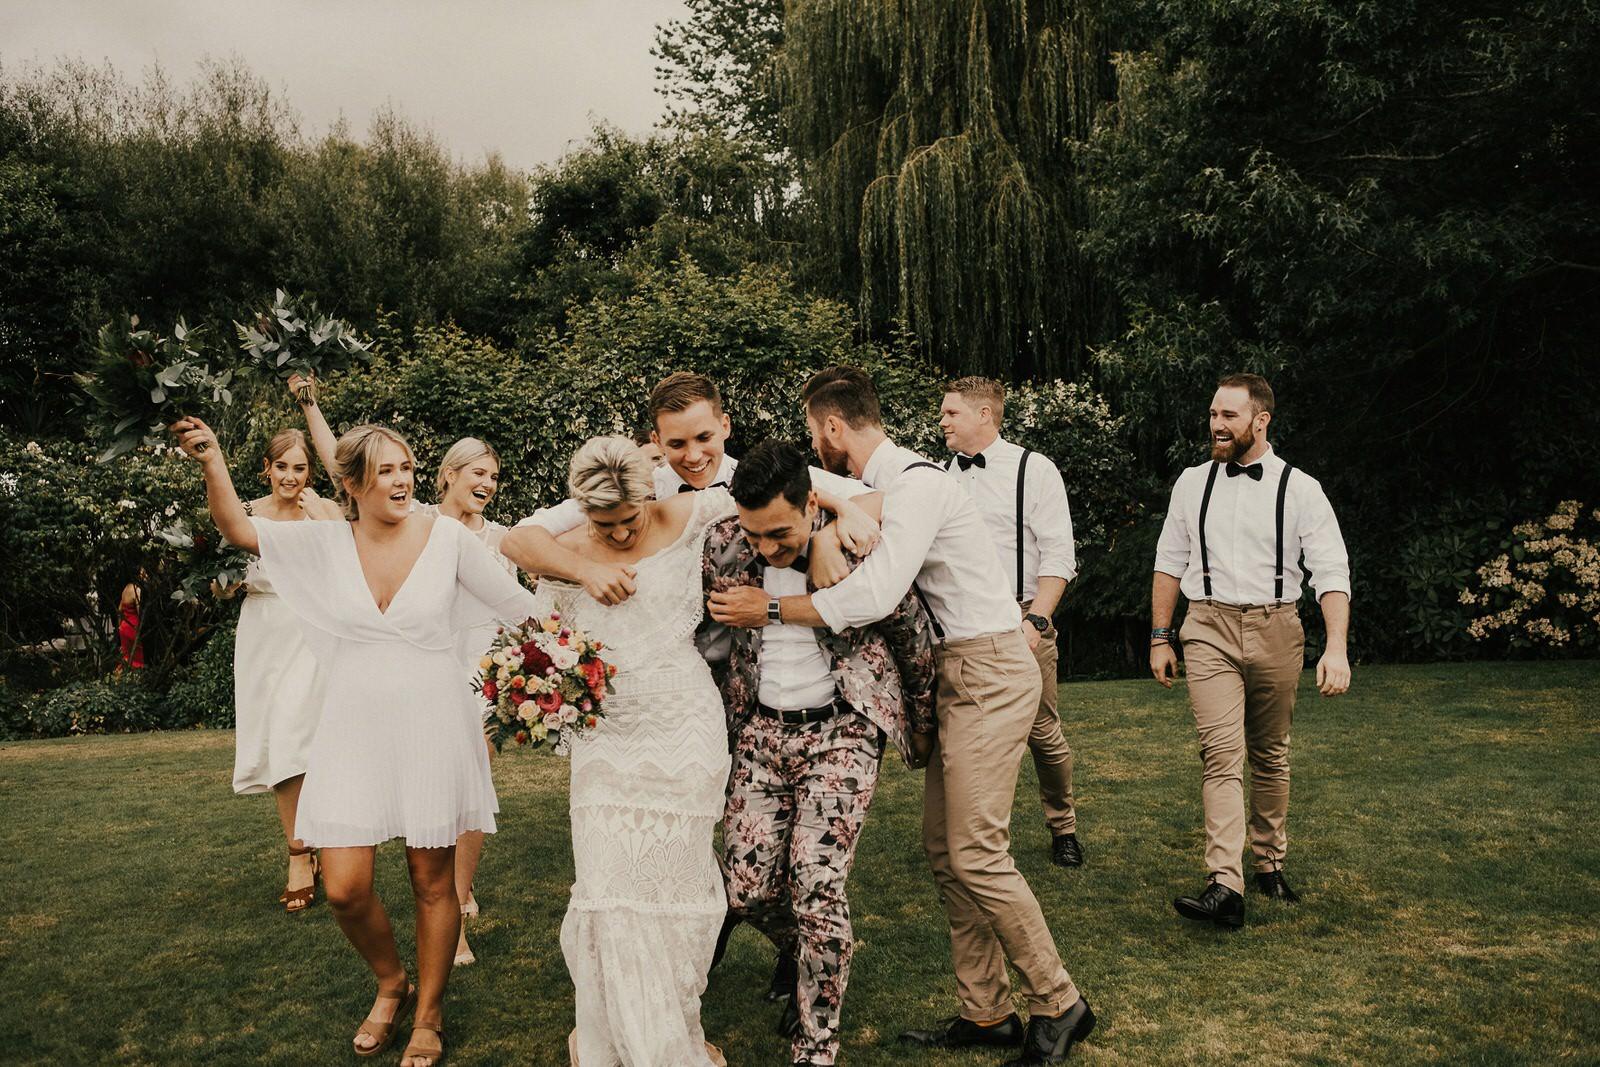 Wairarapa-Wedding_The-Landing_051.JPG